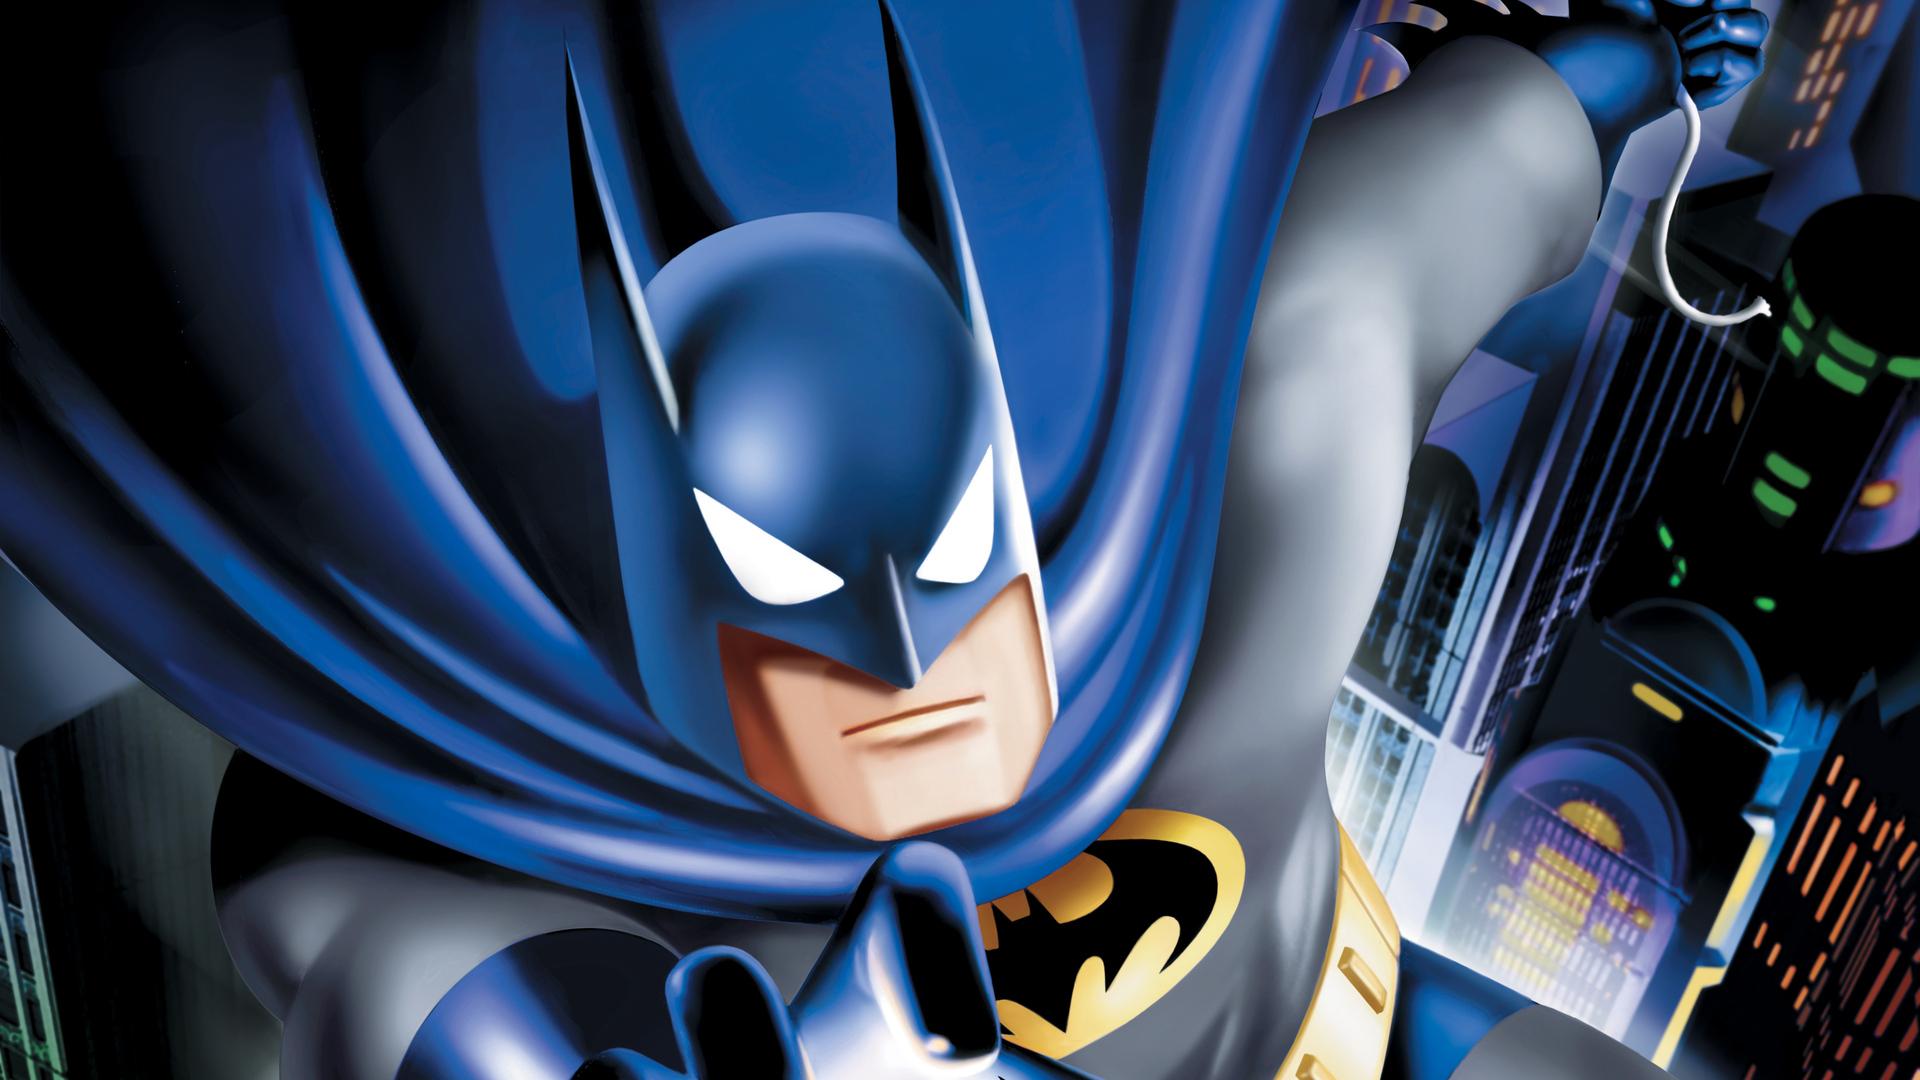 1920x1080 Batman The Animated Series 4k Laptop Full HD ...